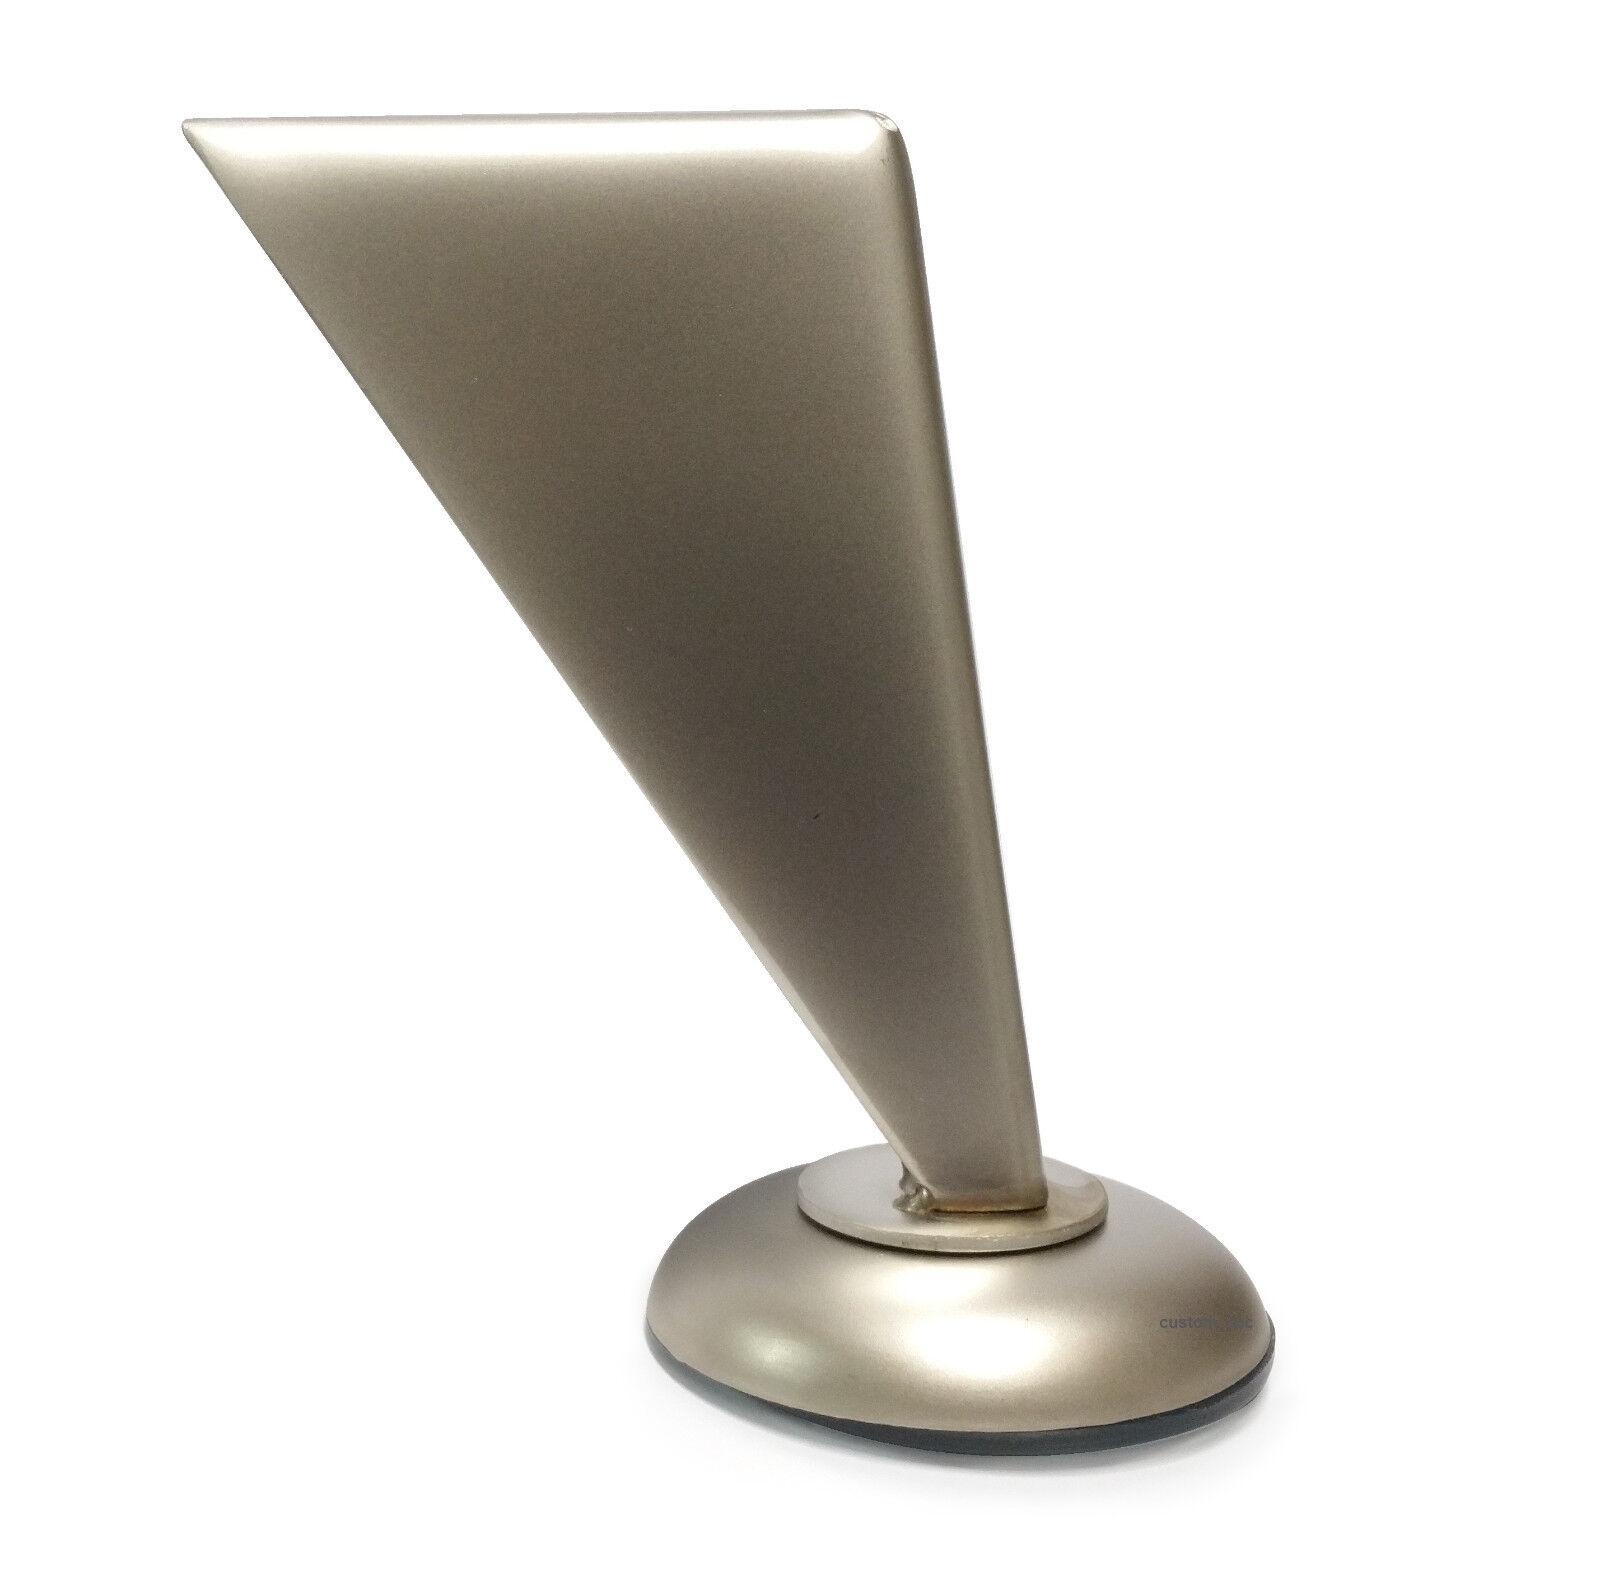 4.5″ Brushed Nickel Metal Straight Slanted Furniture Legs – Set of 4 Furniture